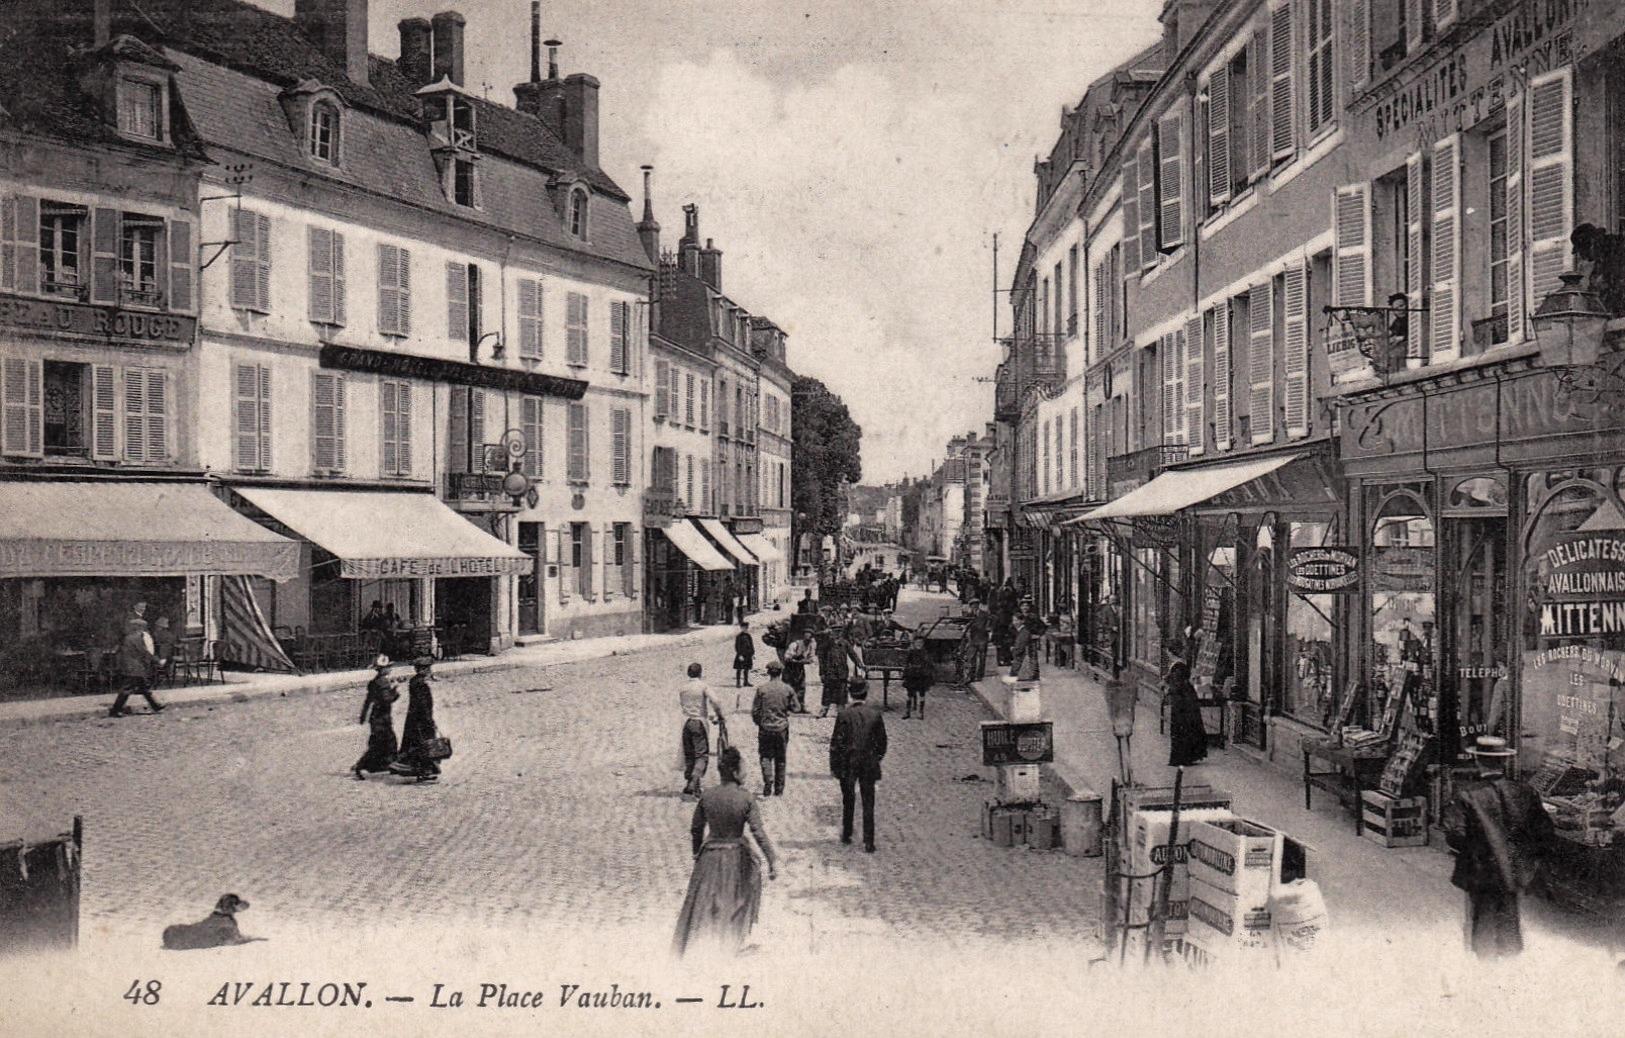 Avallon (89) La place Vauban CPA